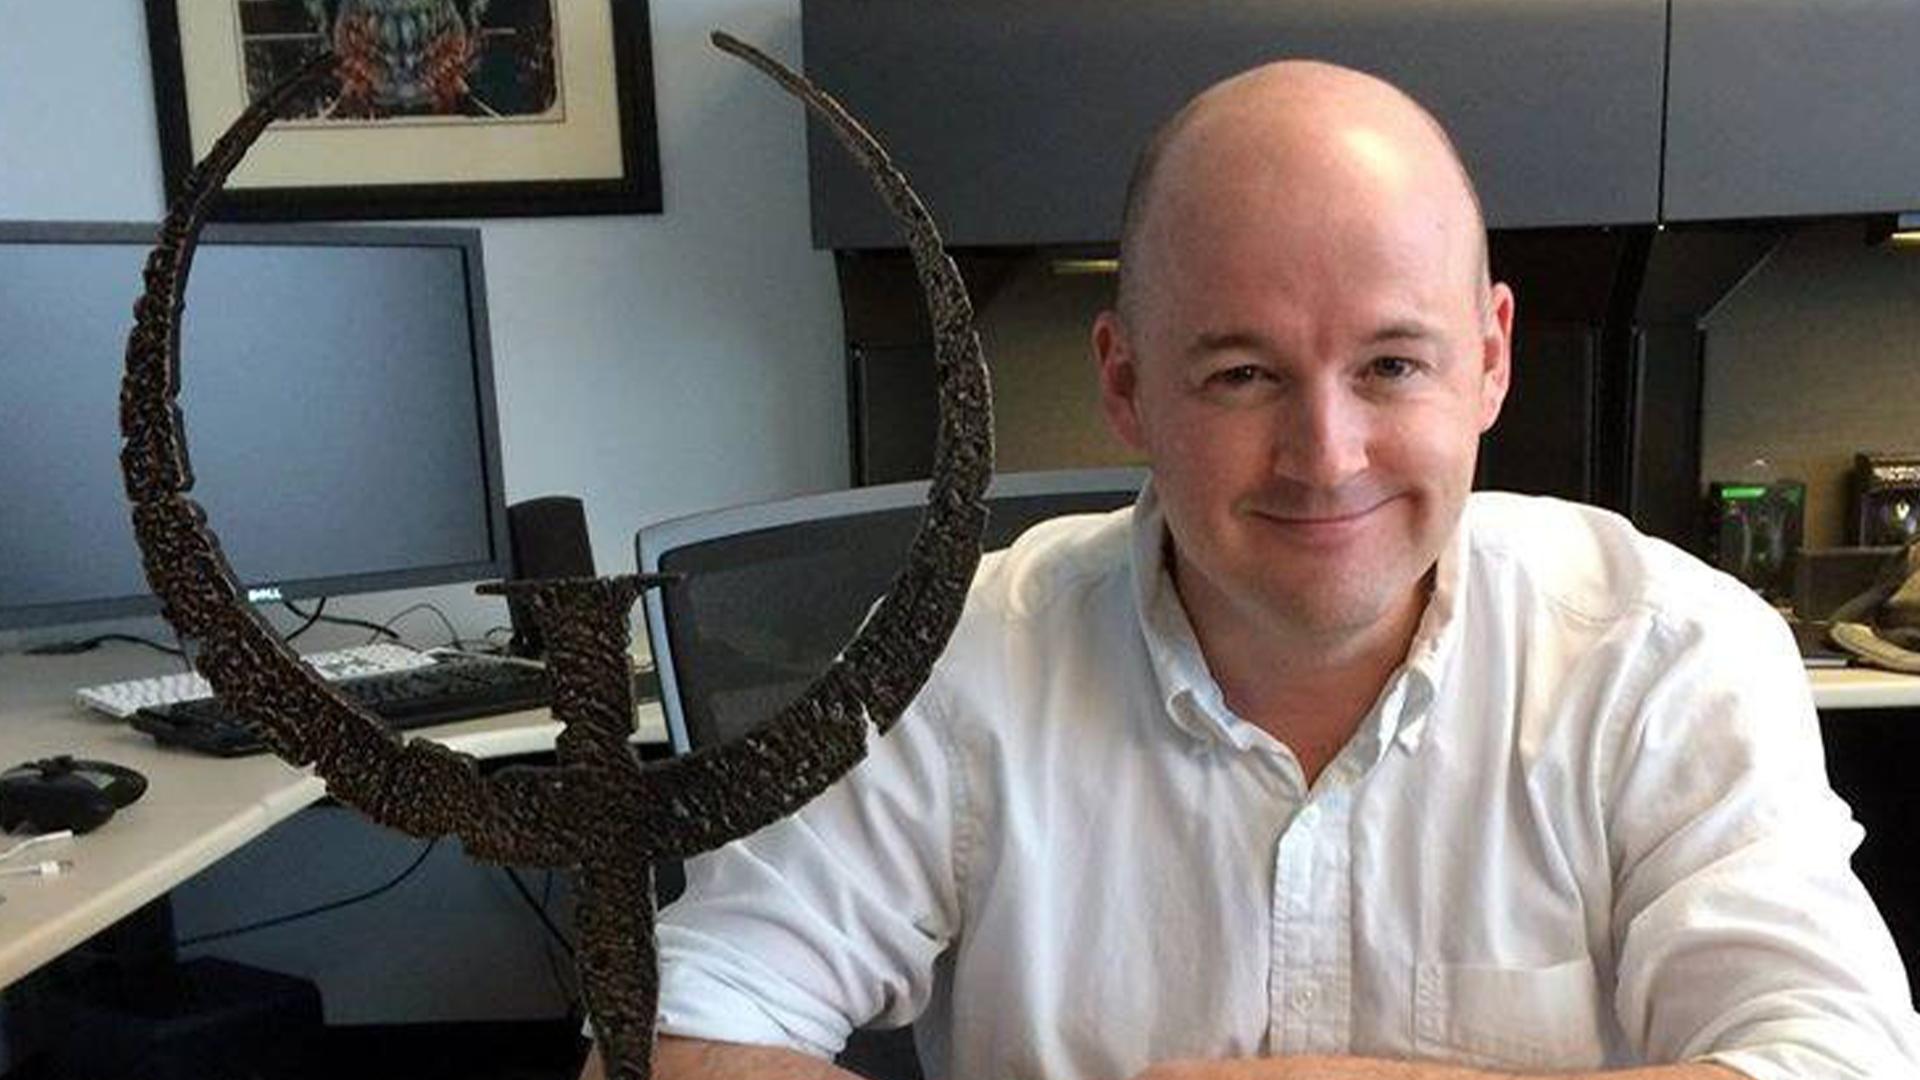 Gamelab 2020   تیم ویلیتس از تکامل در روحِ بازیها میگوید